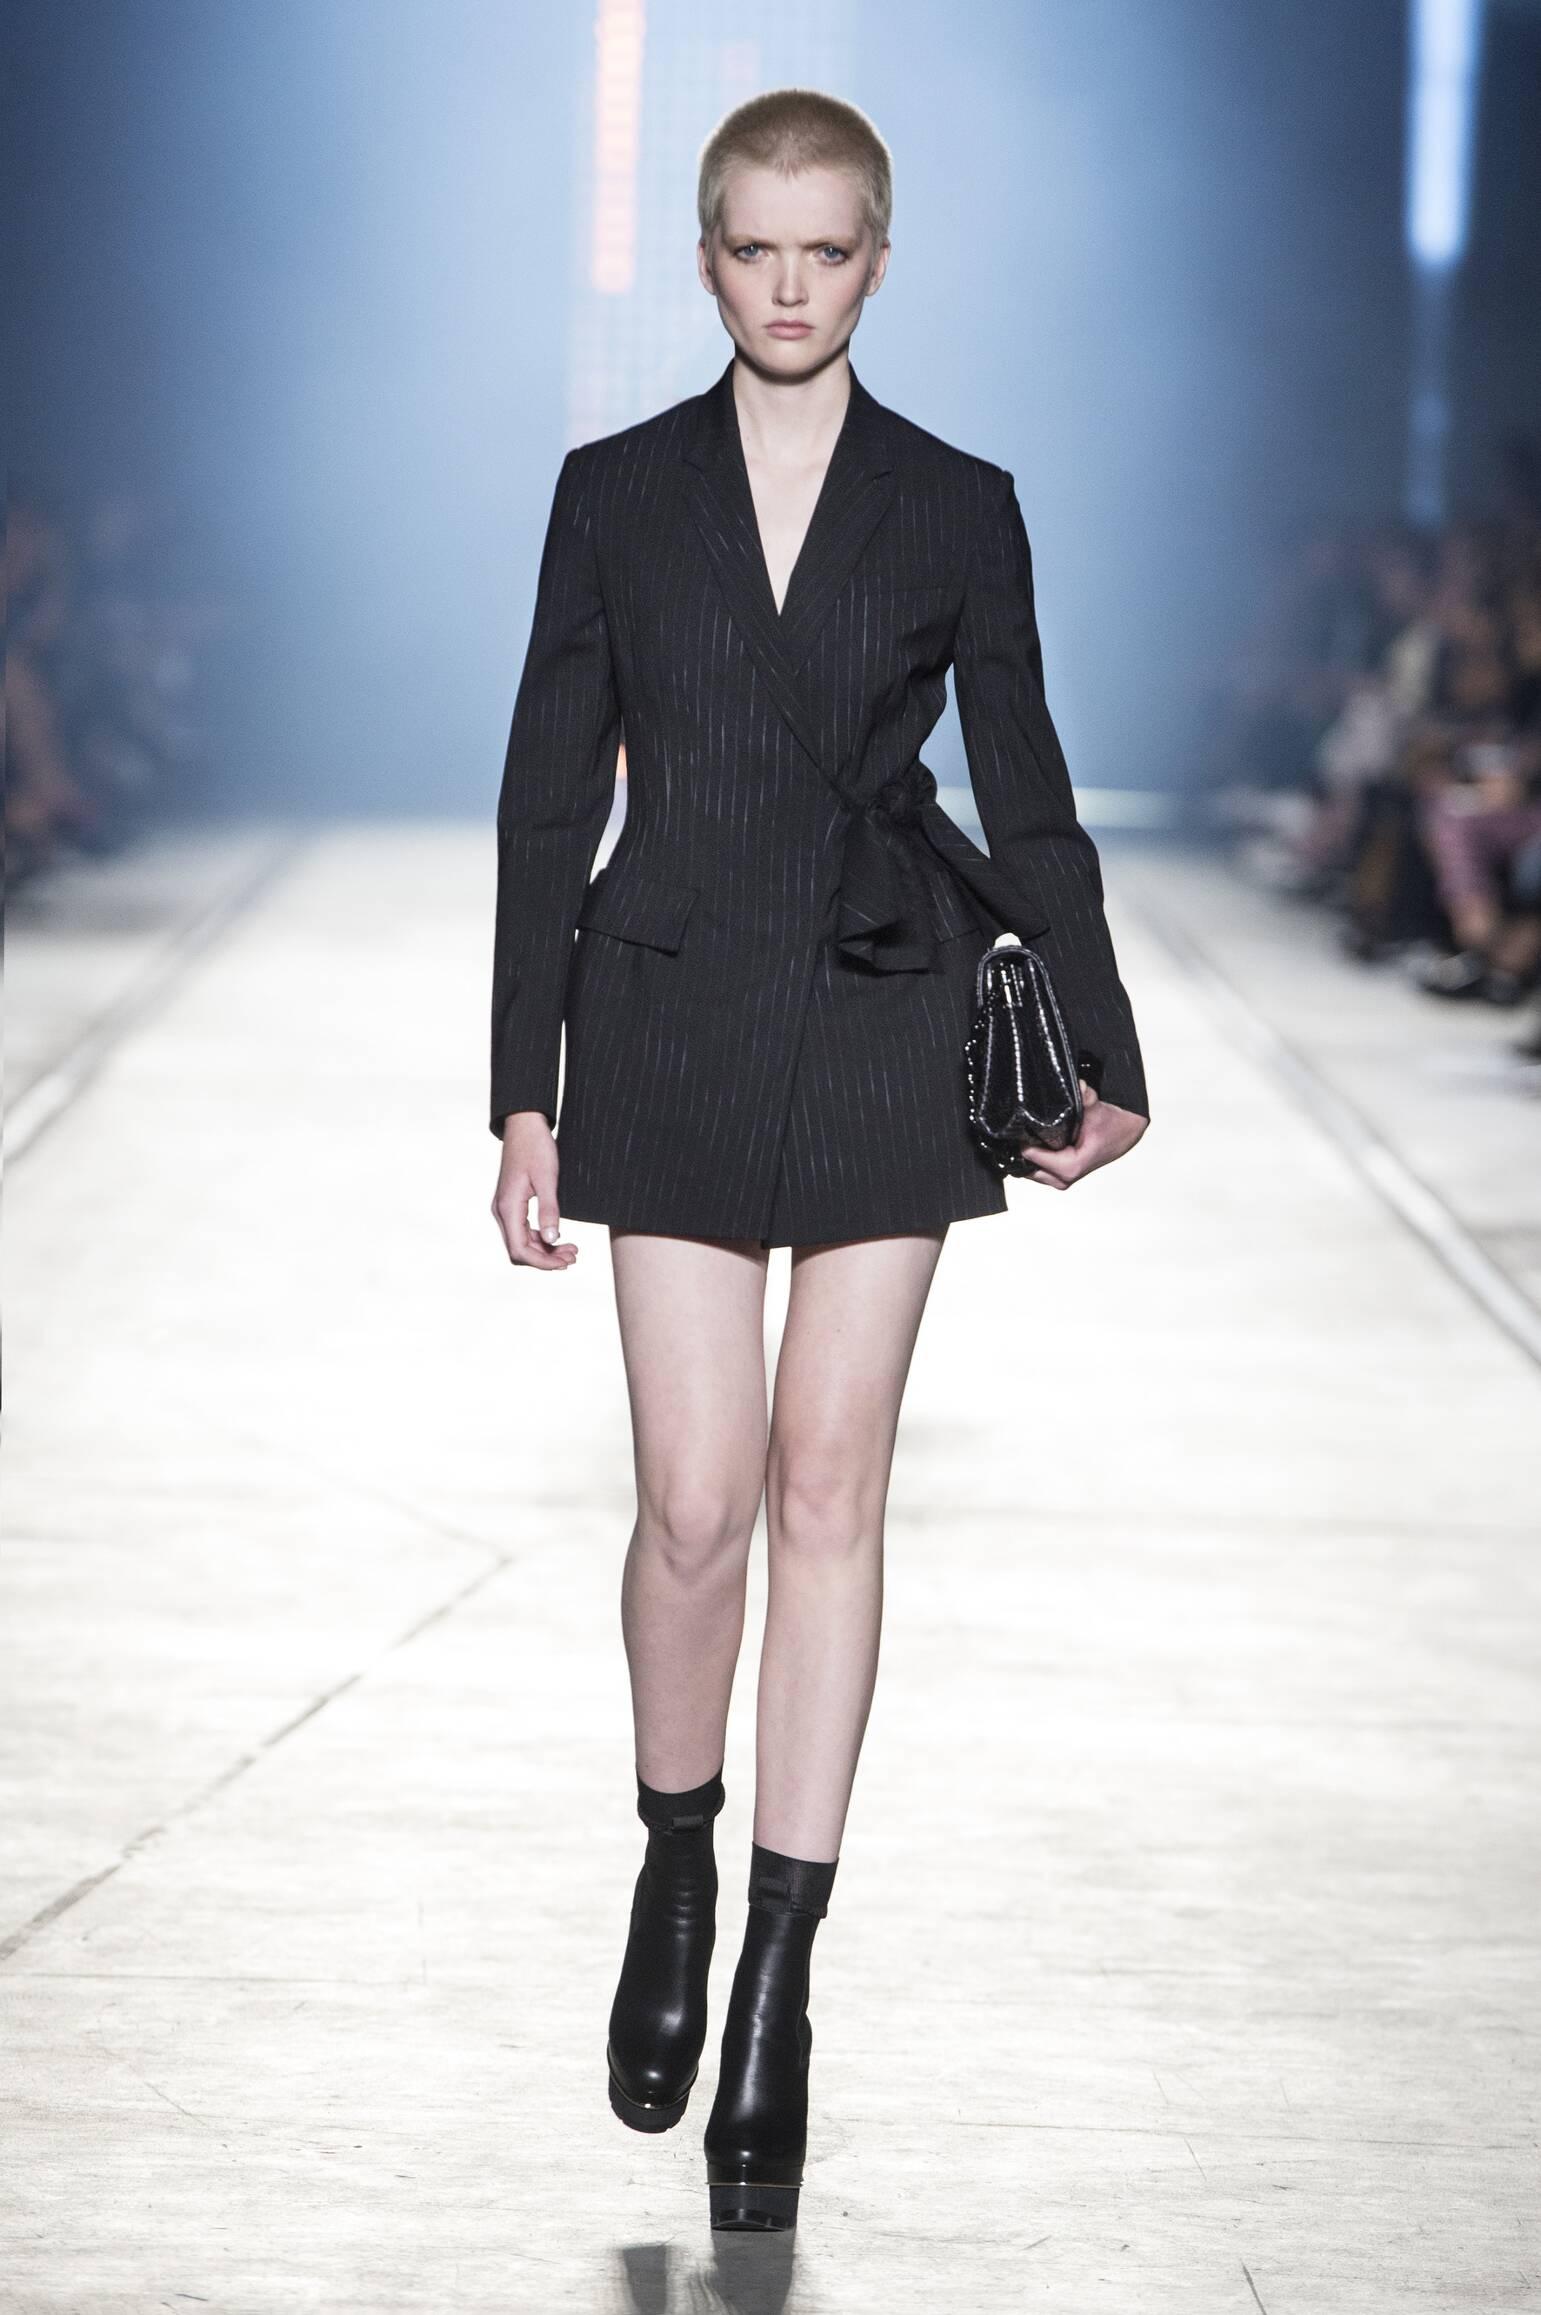 Versace Spring 2016 Catwalk